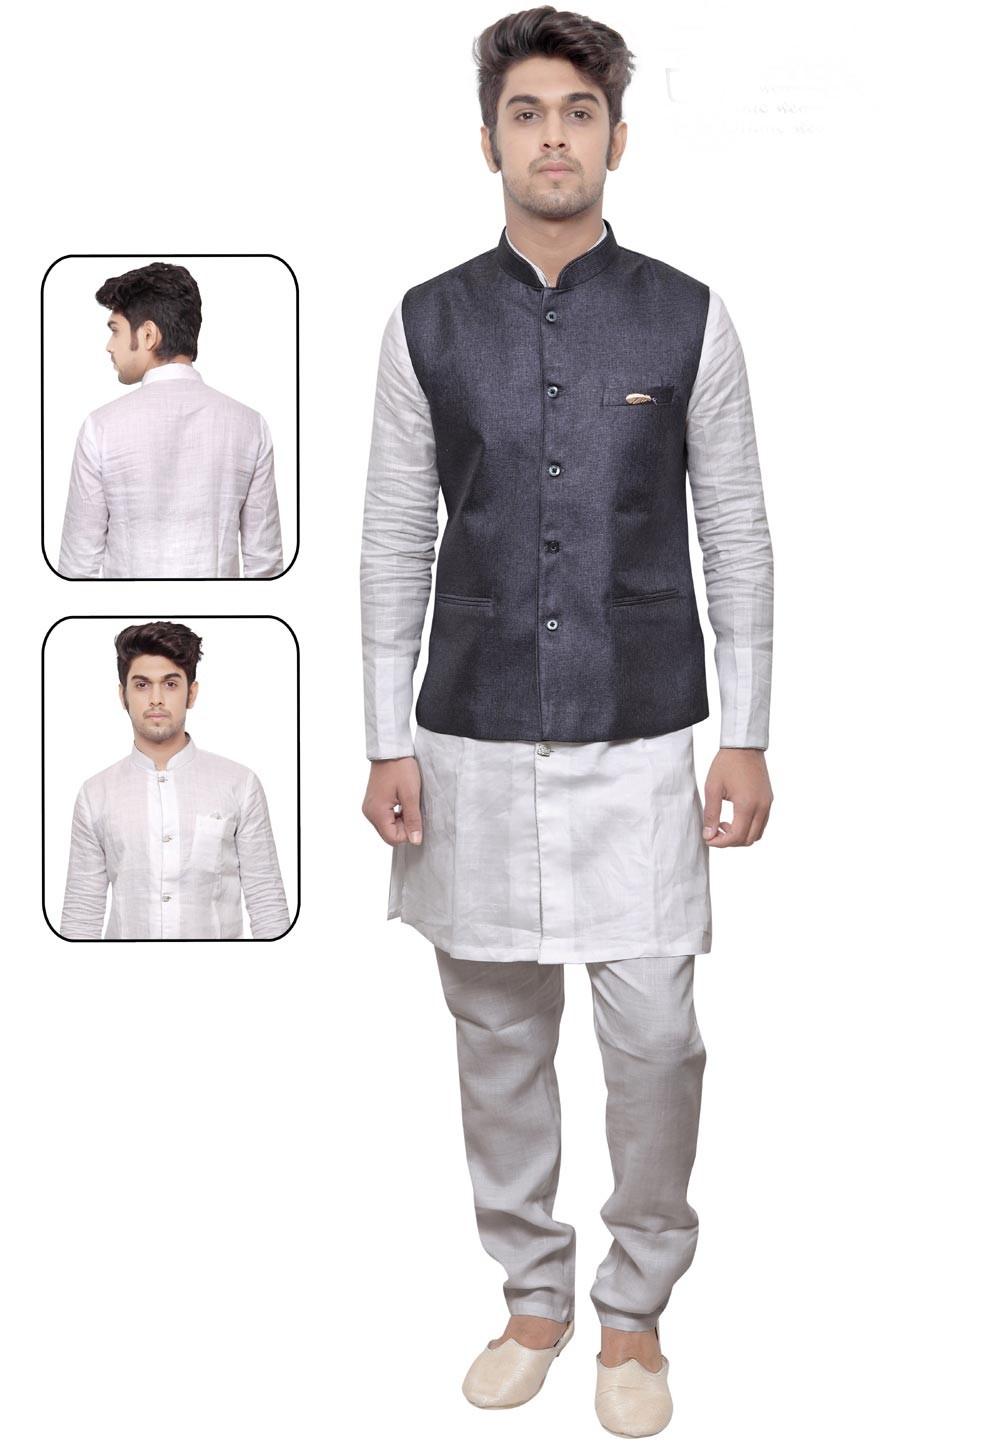 Men's Exquisite White,Blue Color Linen,Cotton Readymade Kurta Pajama.